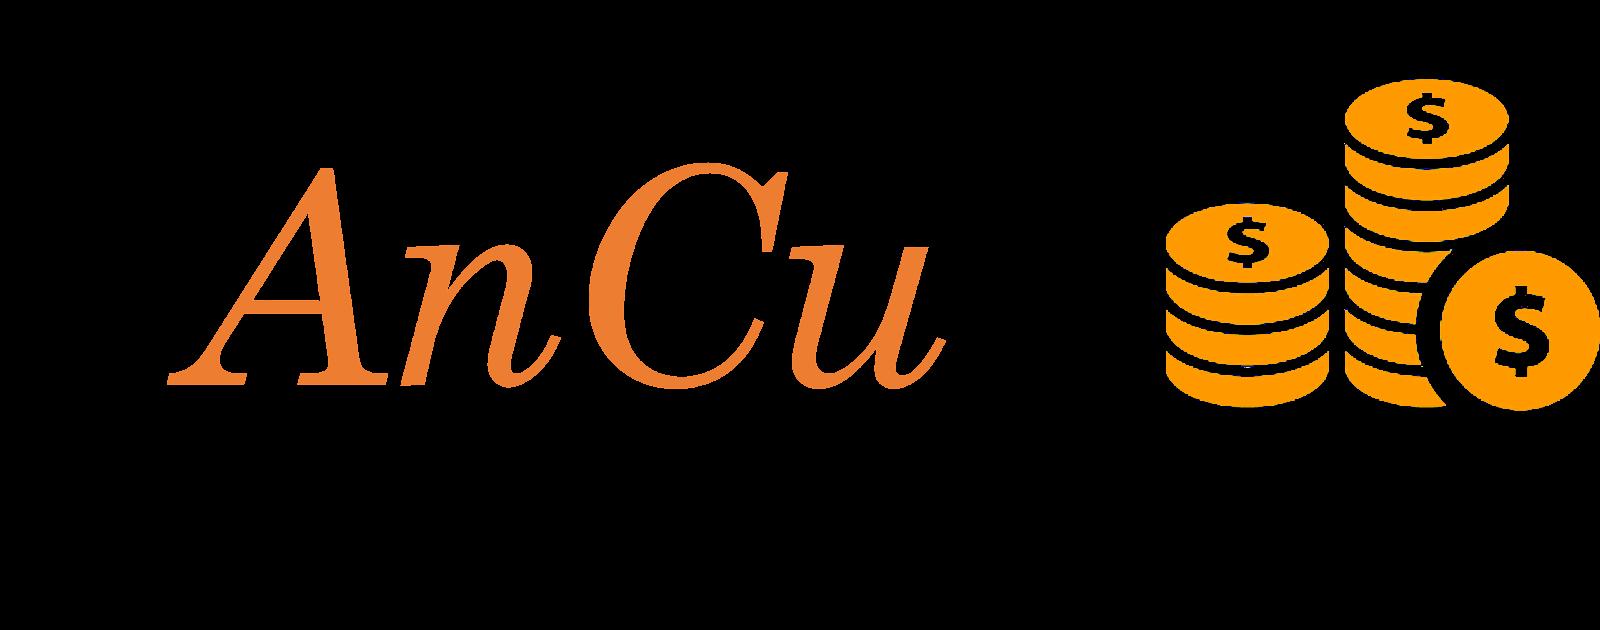 ANCU Cryptocurrency